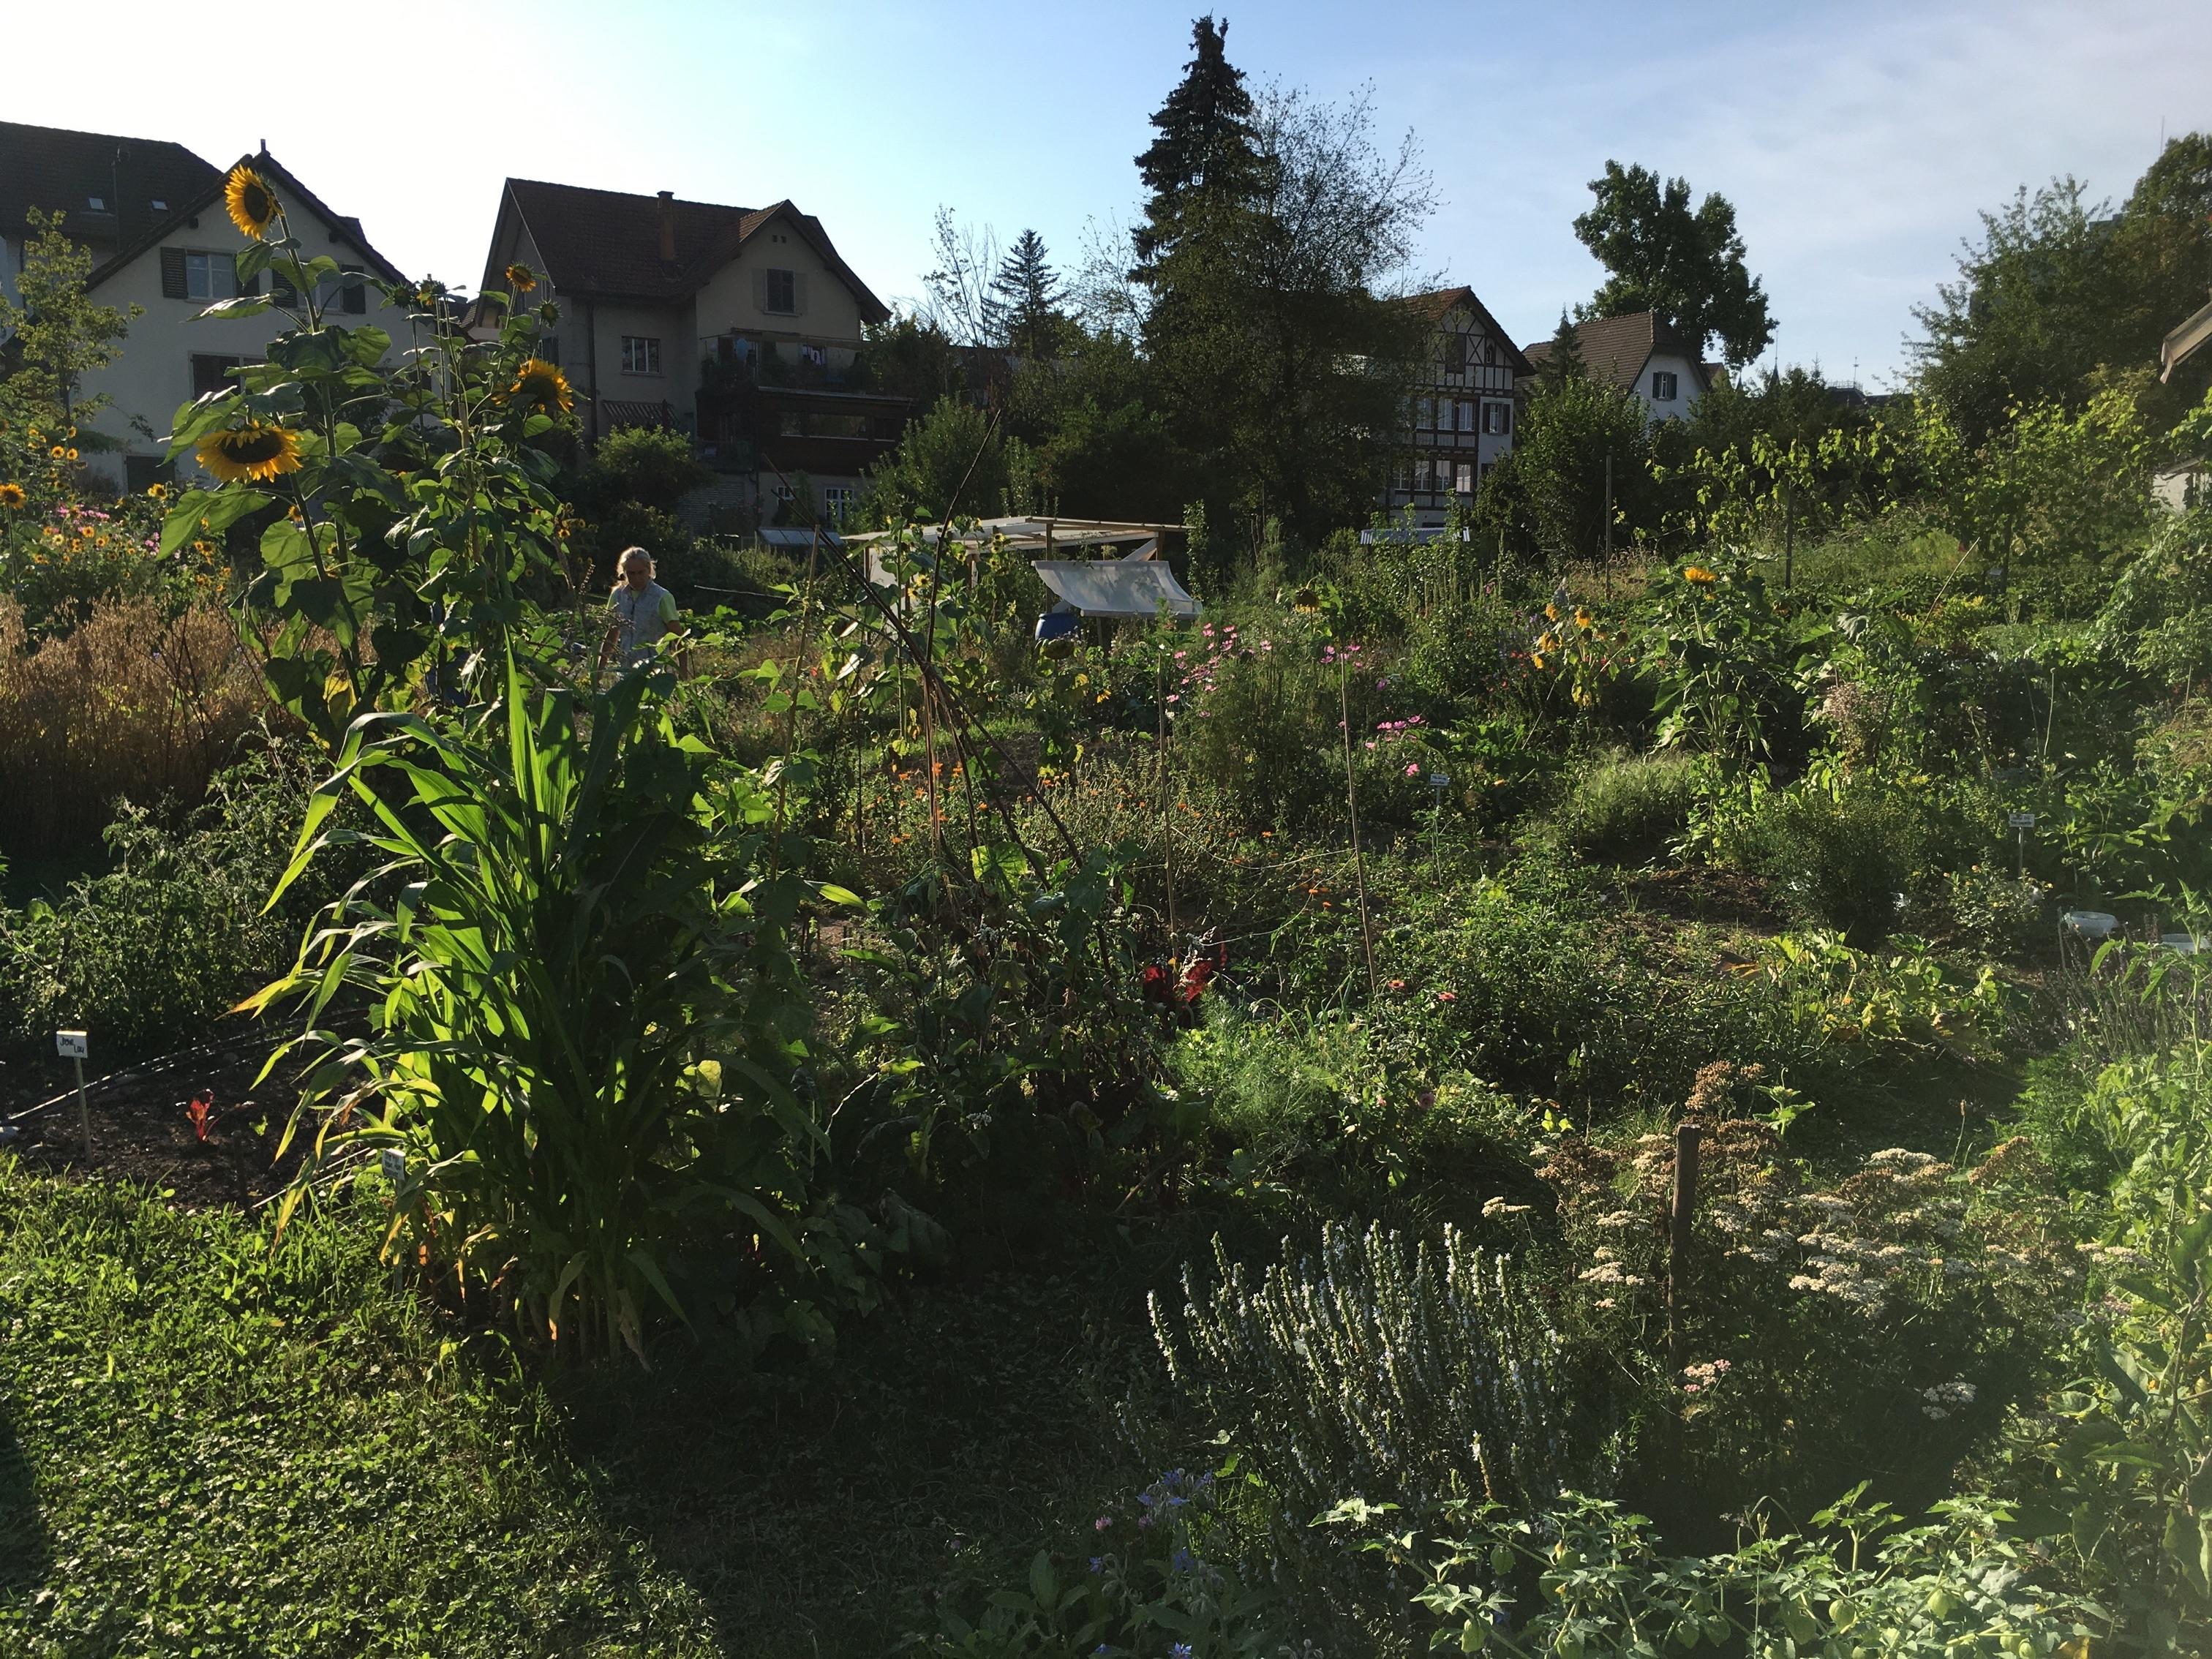 2020-08-13 Ogif Garten 3